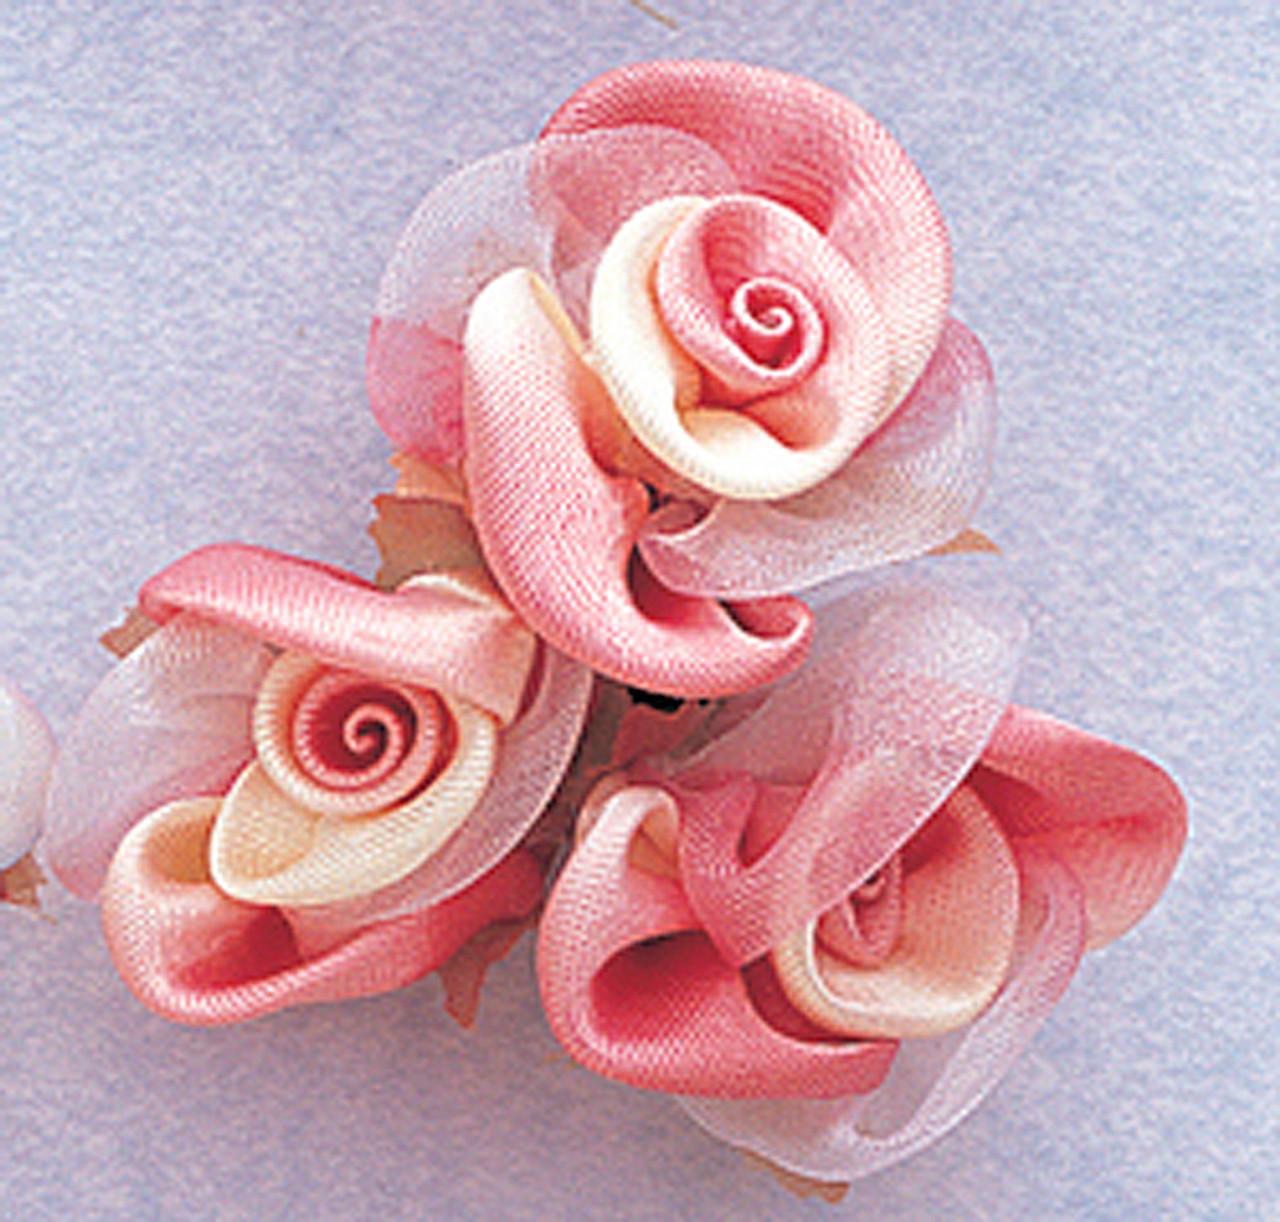 1 mauve satin silk flowers pack of 36 cb flowers crafts 1 mauve satin silk flowers pack mightylinksfo